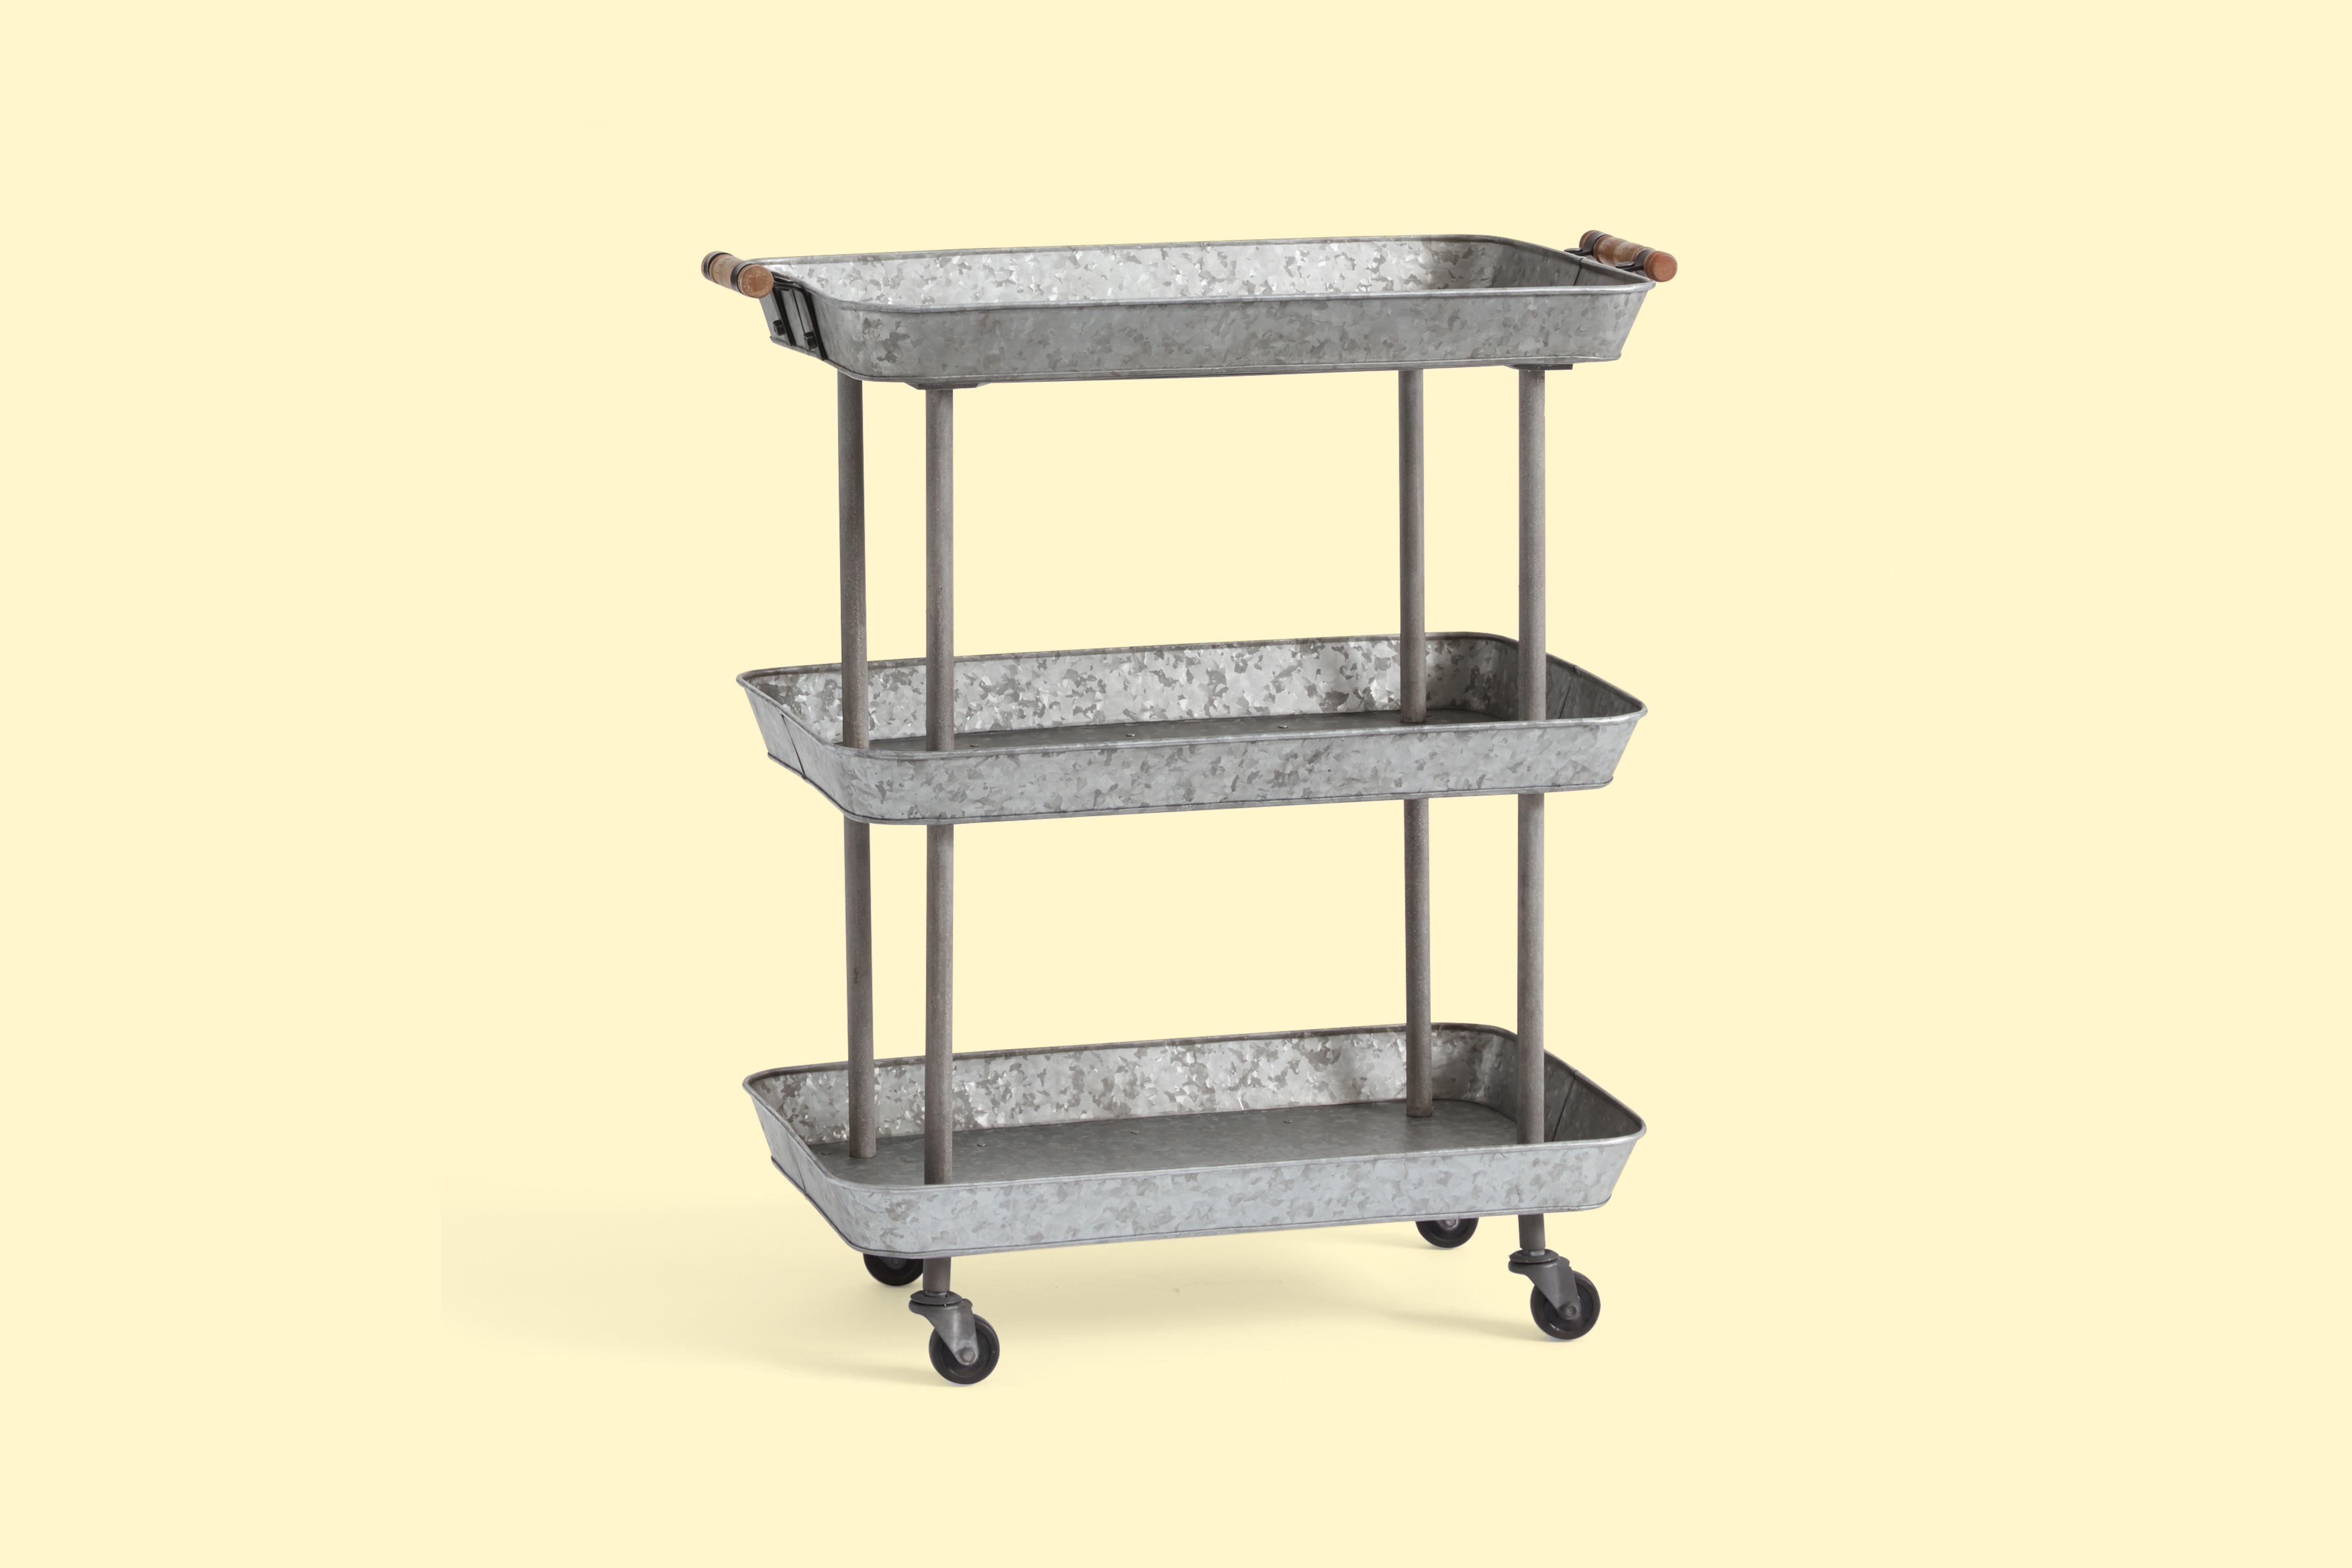 170629-online-furniture-cart